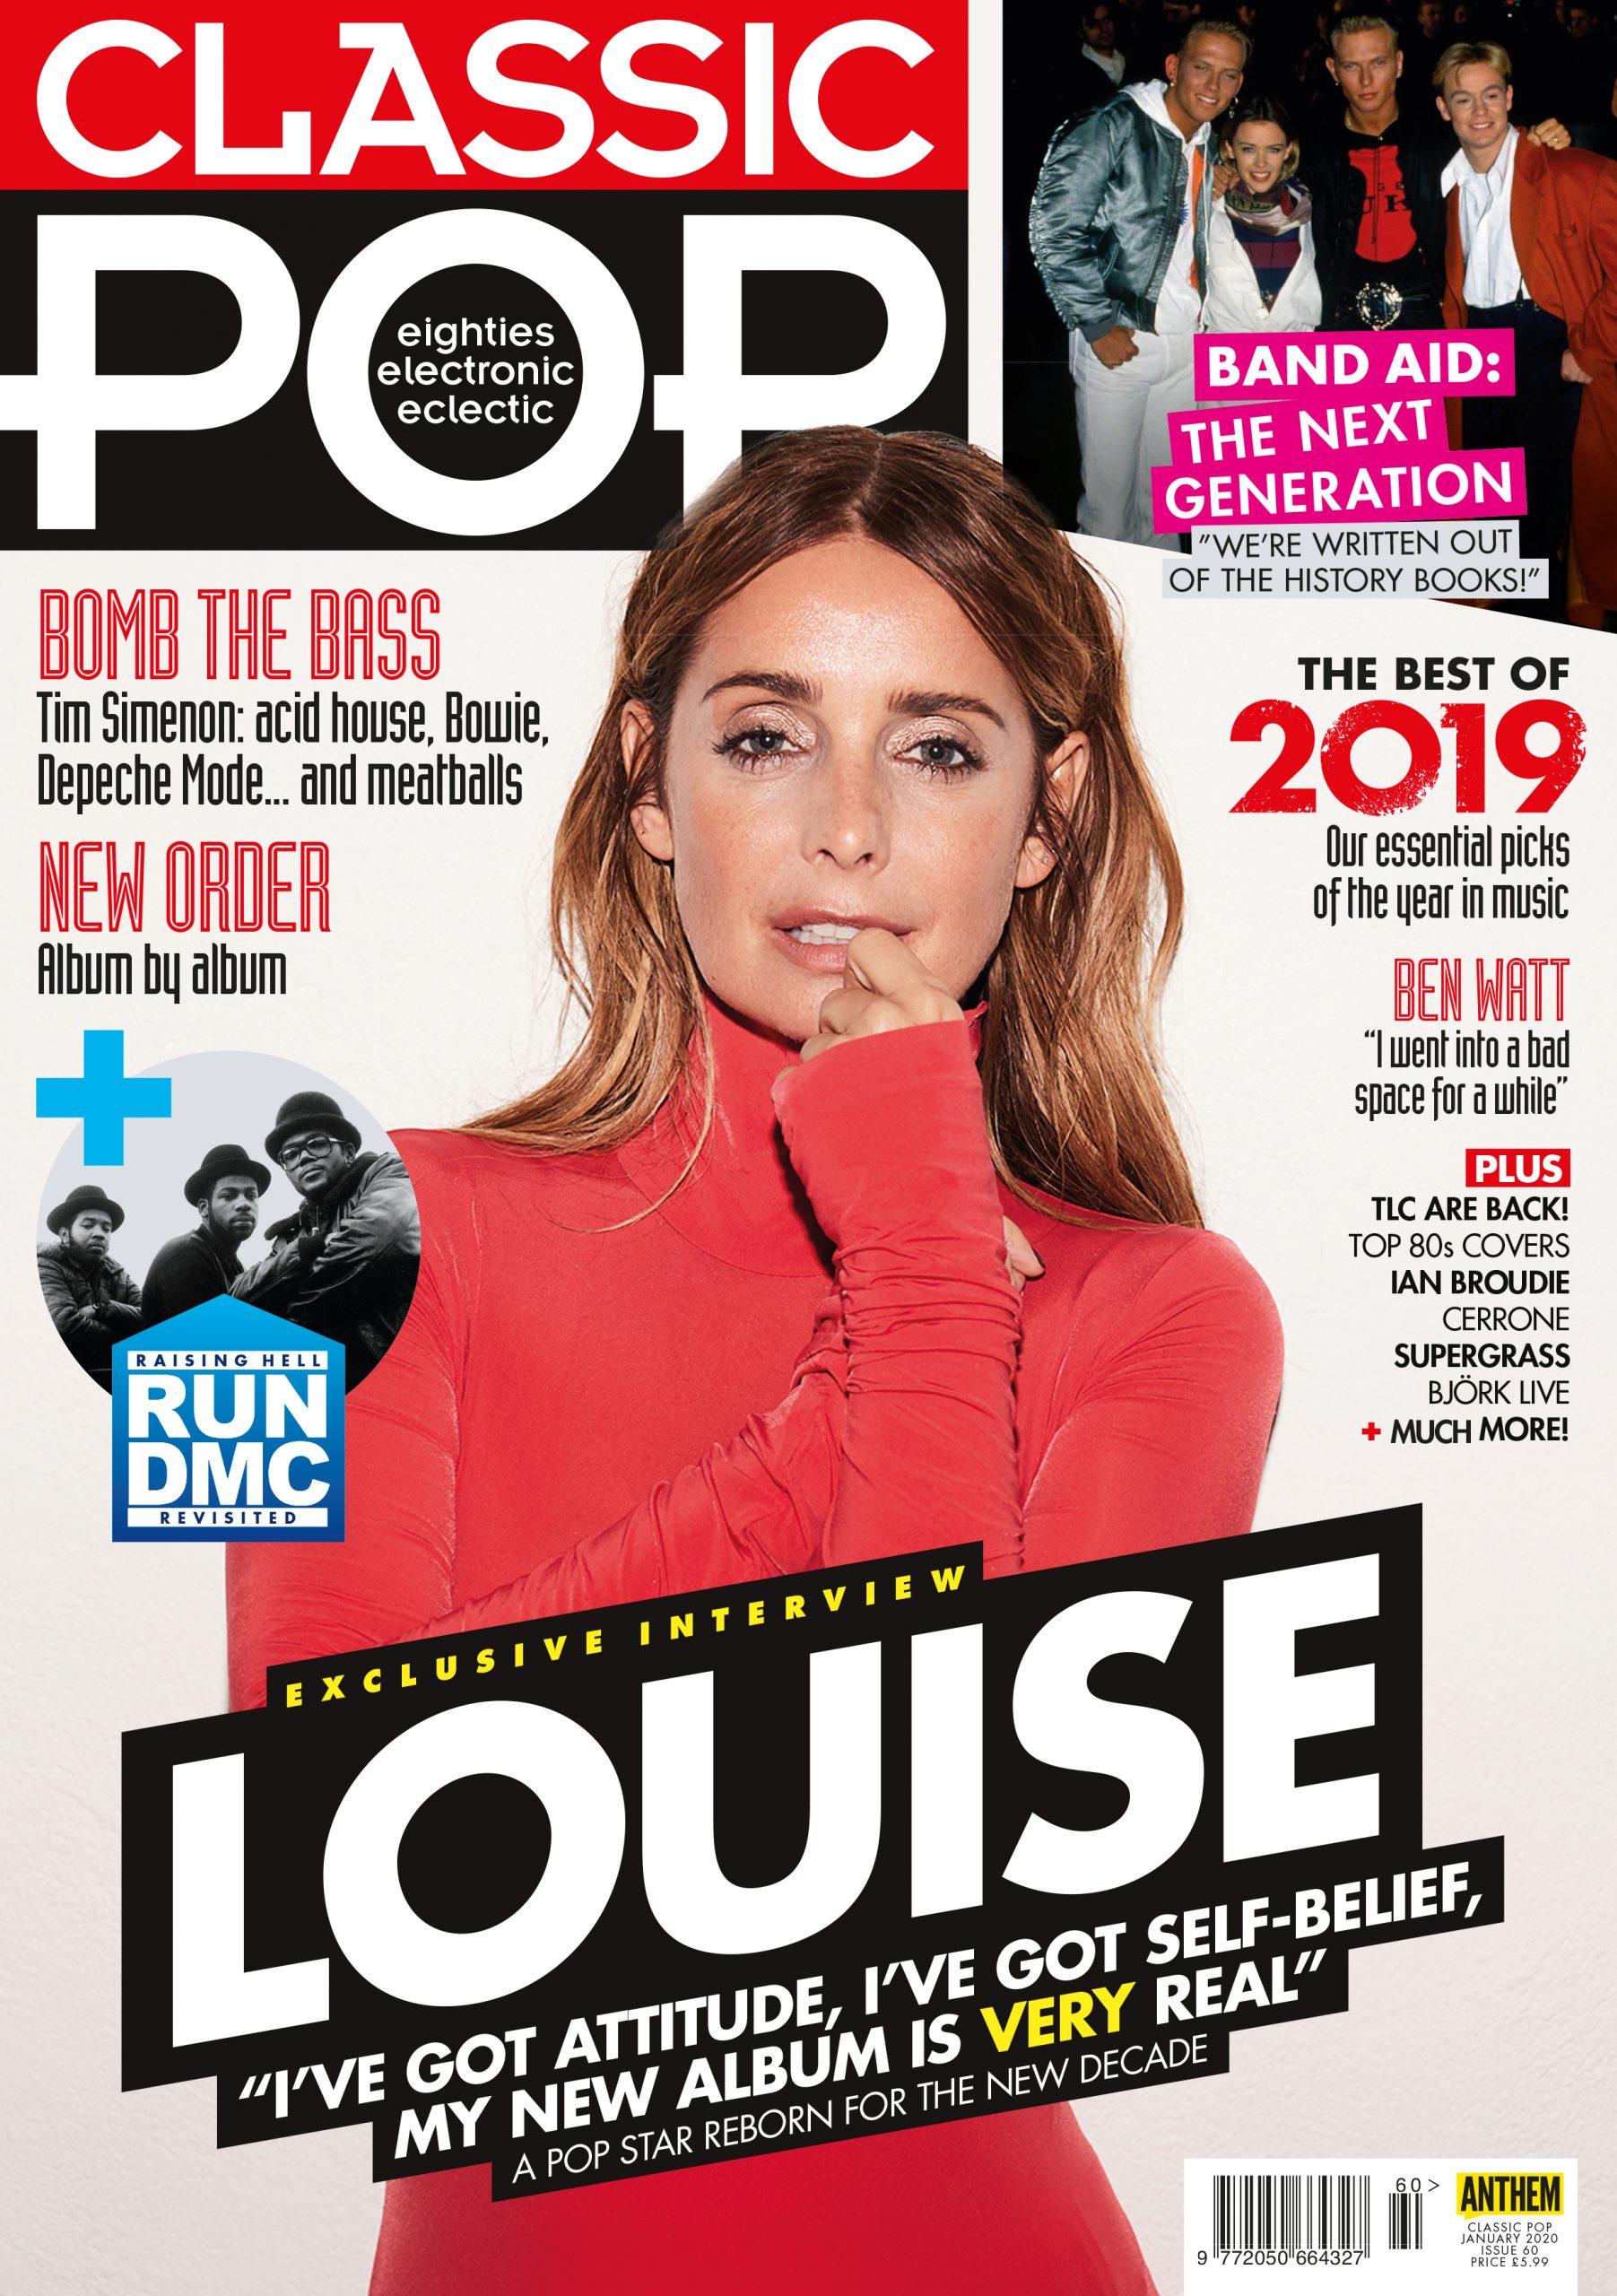 Classic Pop Louise